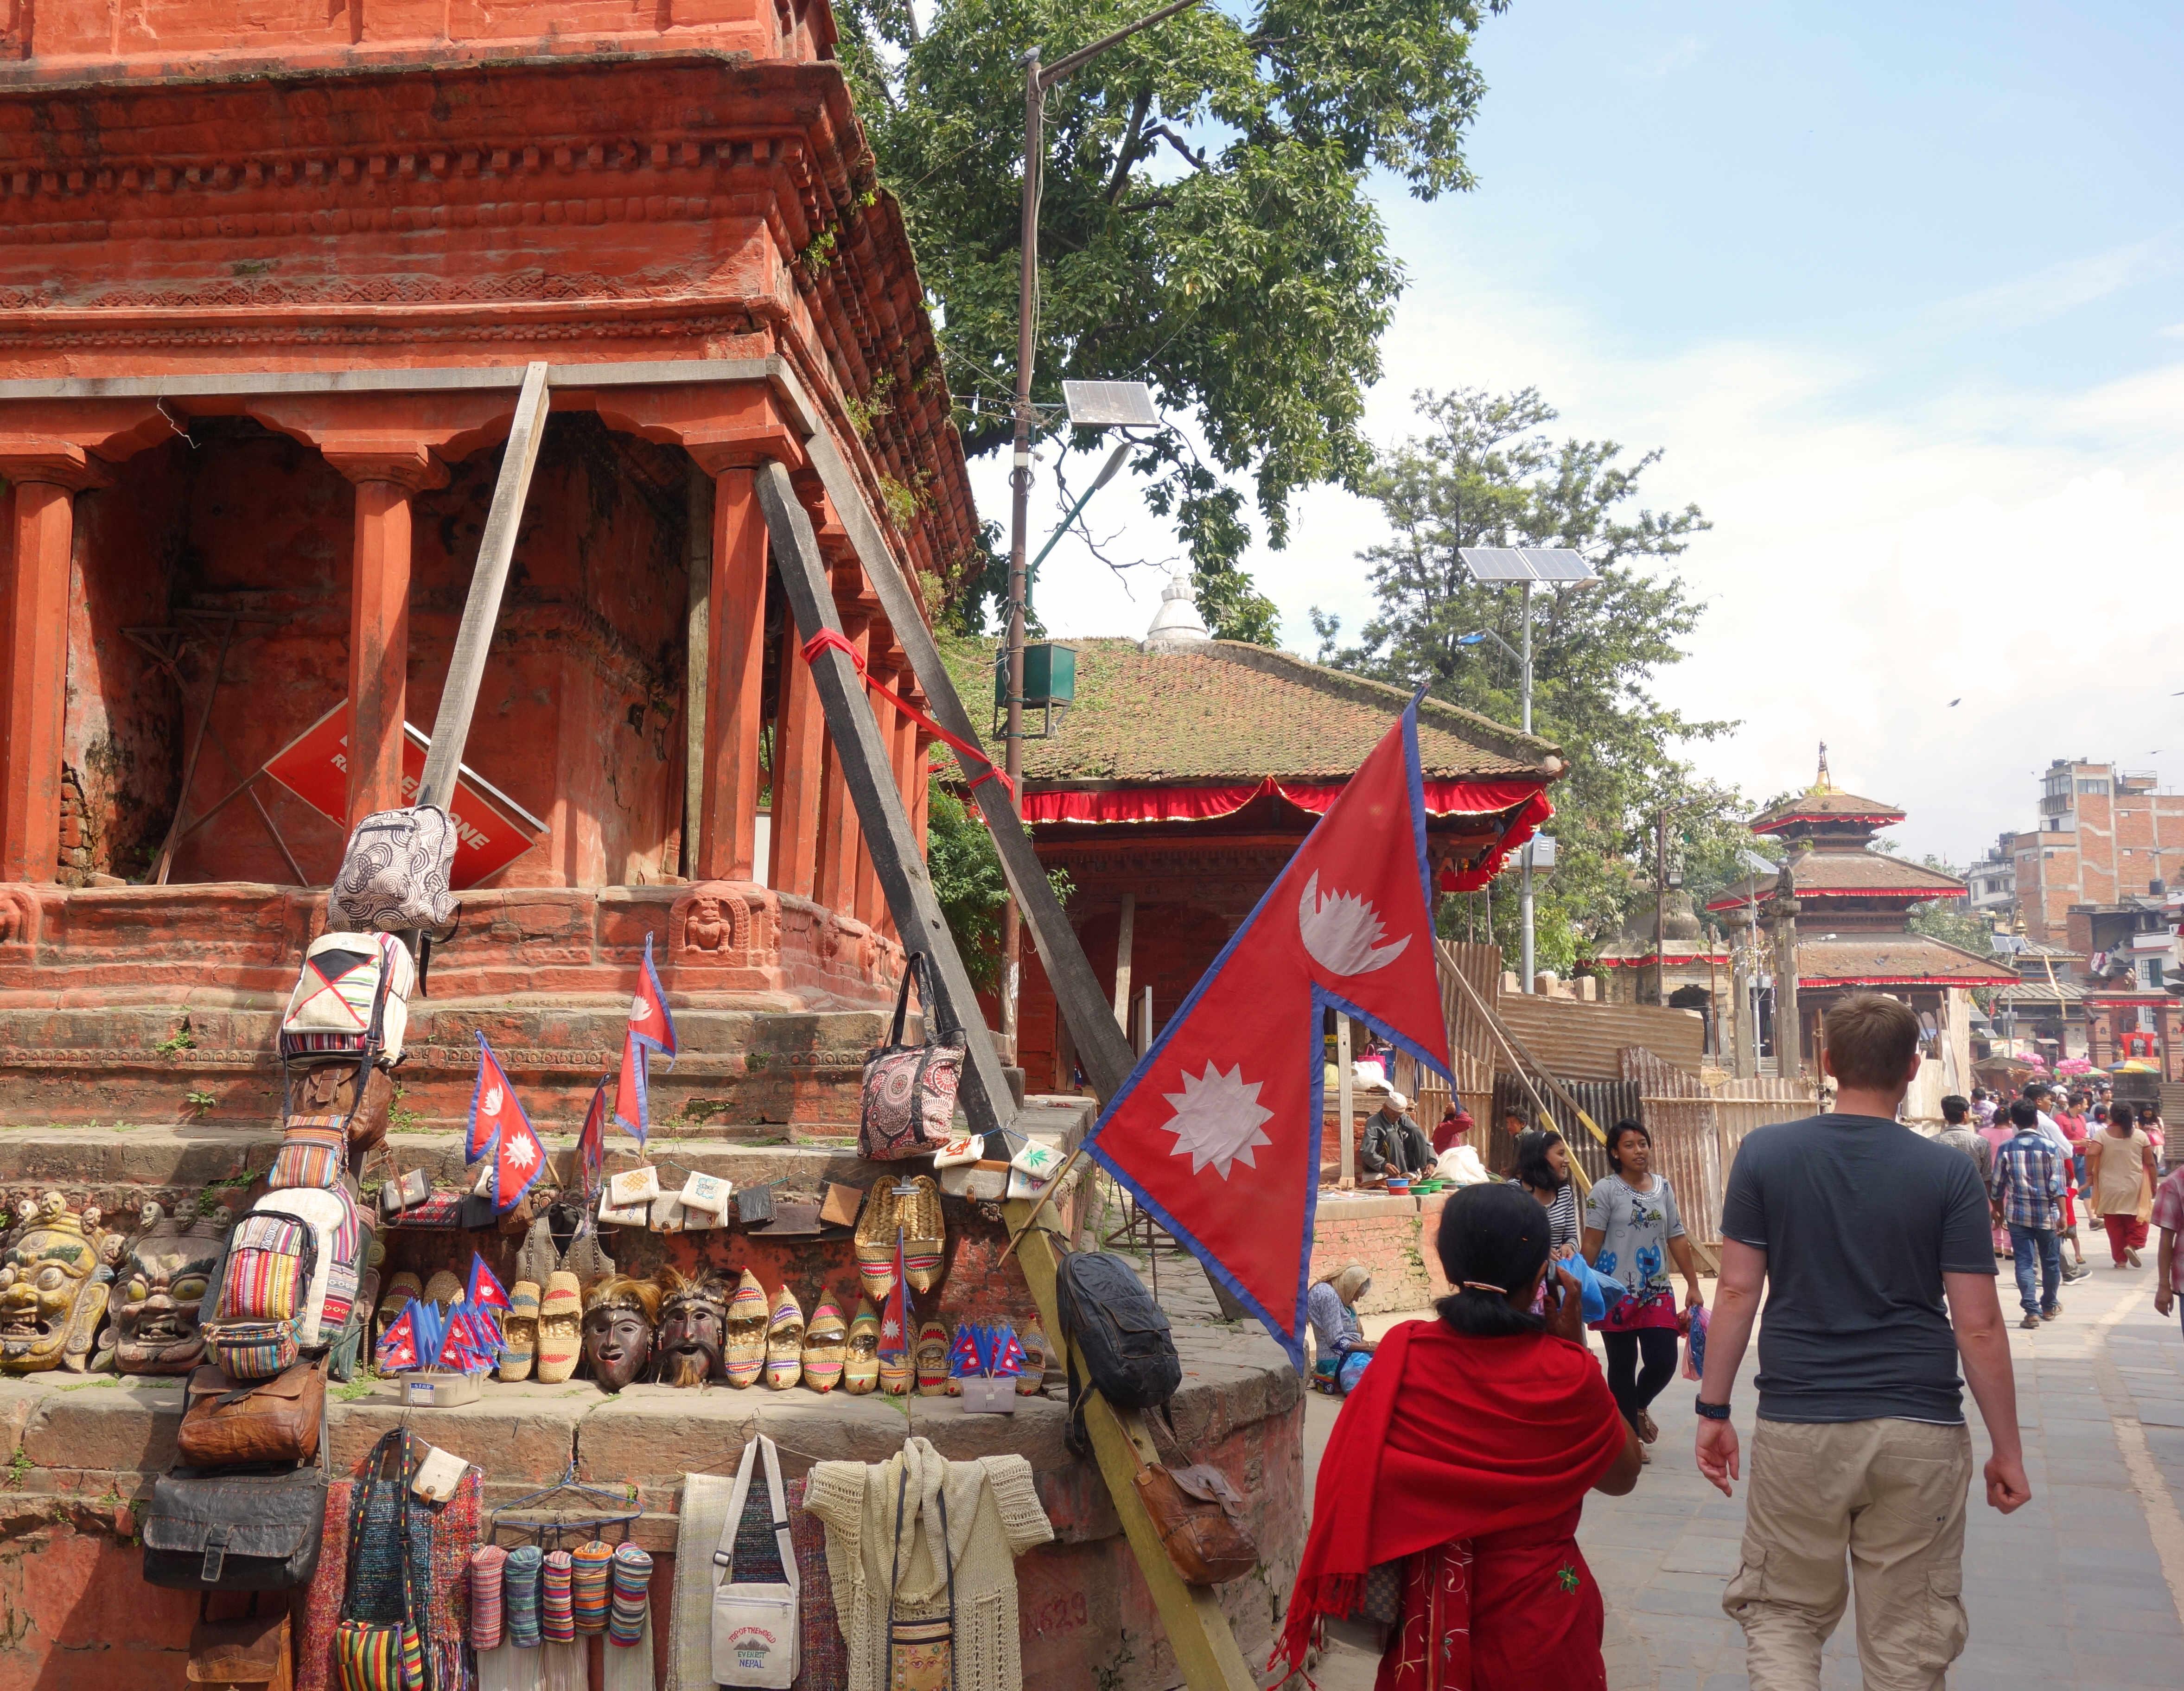 Nepal Kathmandu Durbar Square Tempel mit Stützen